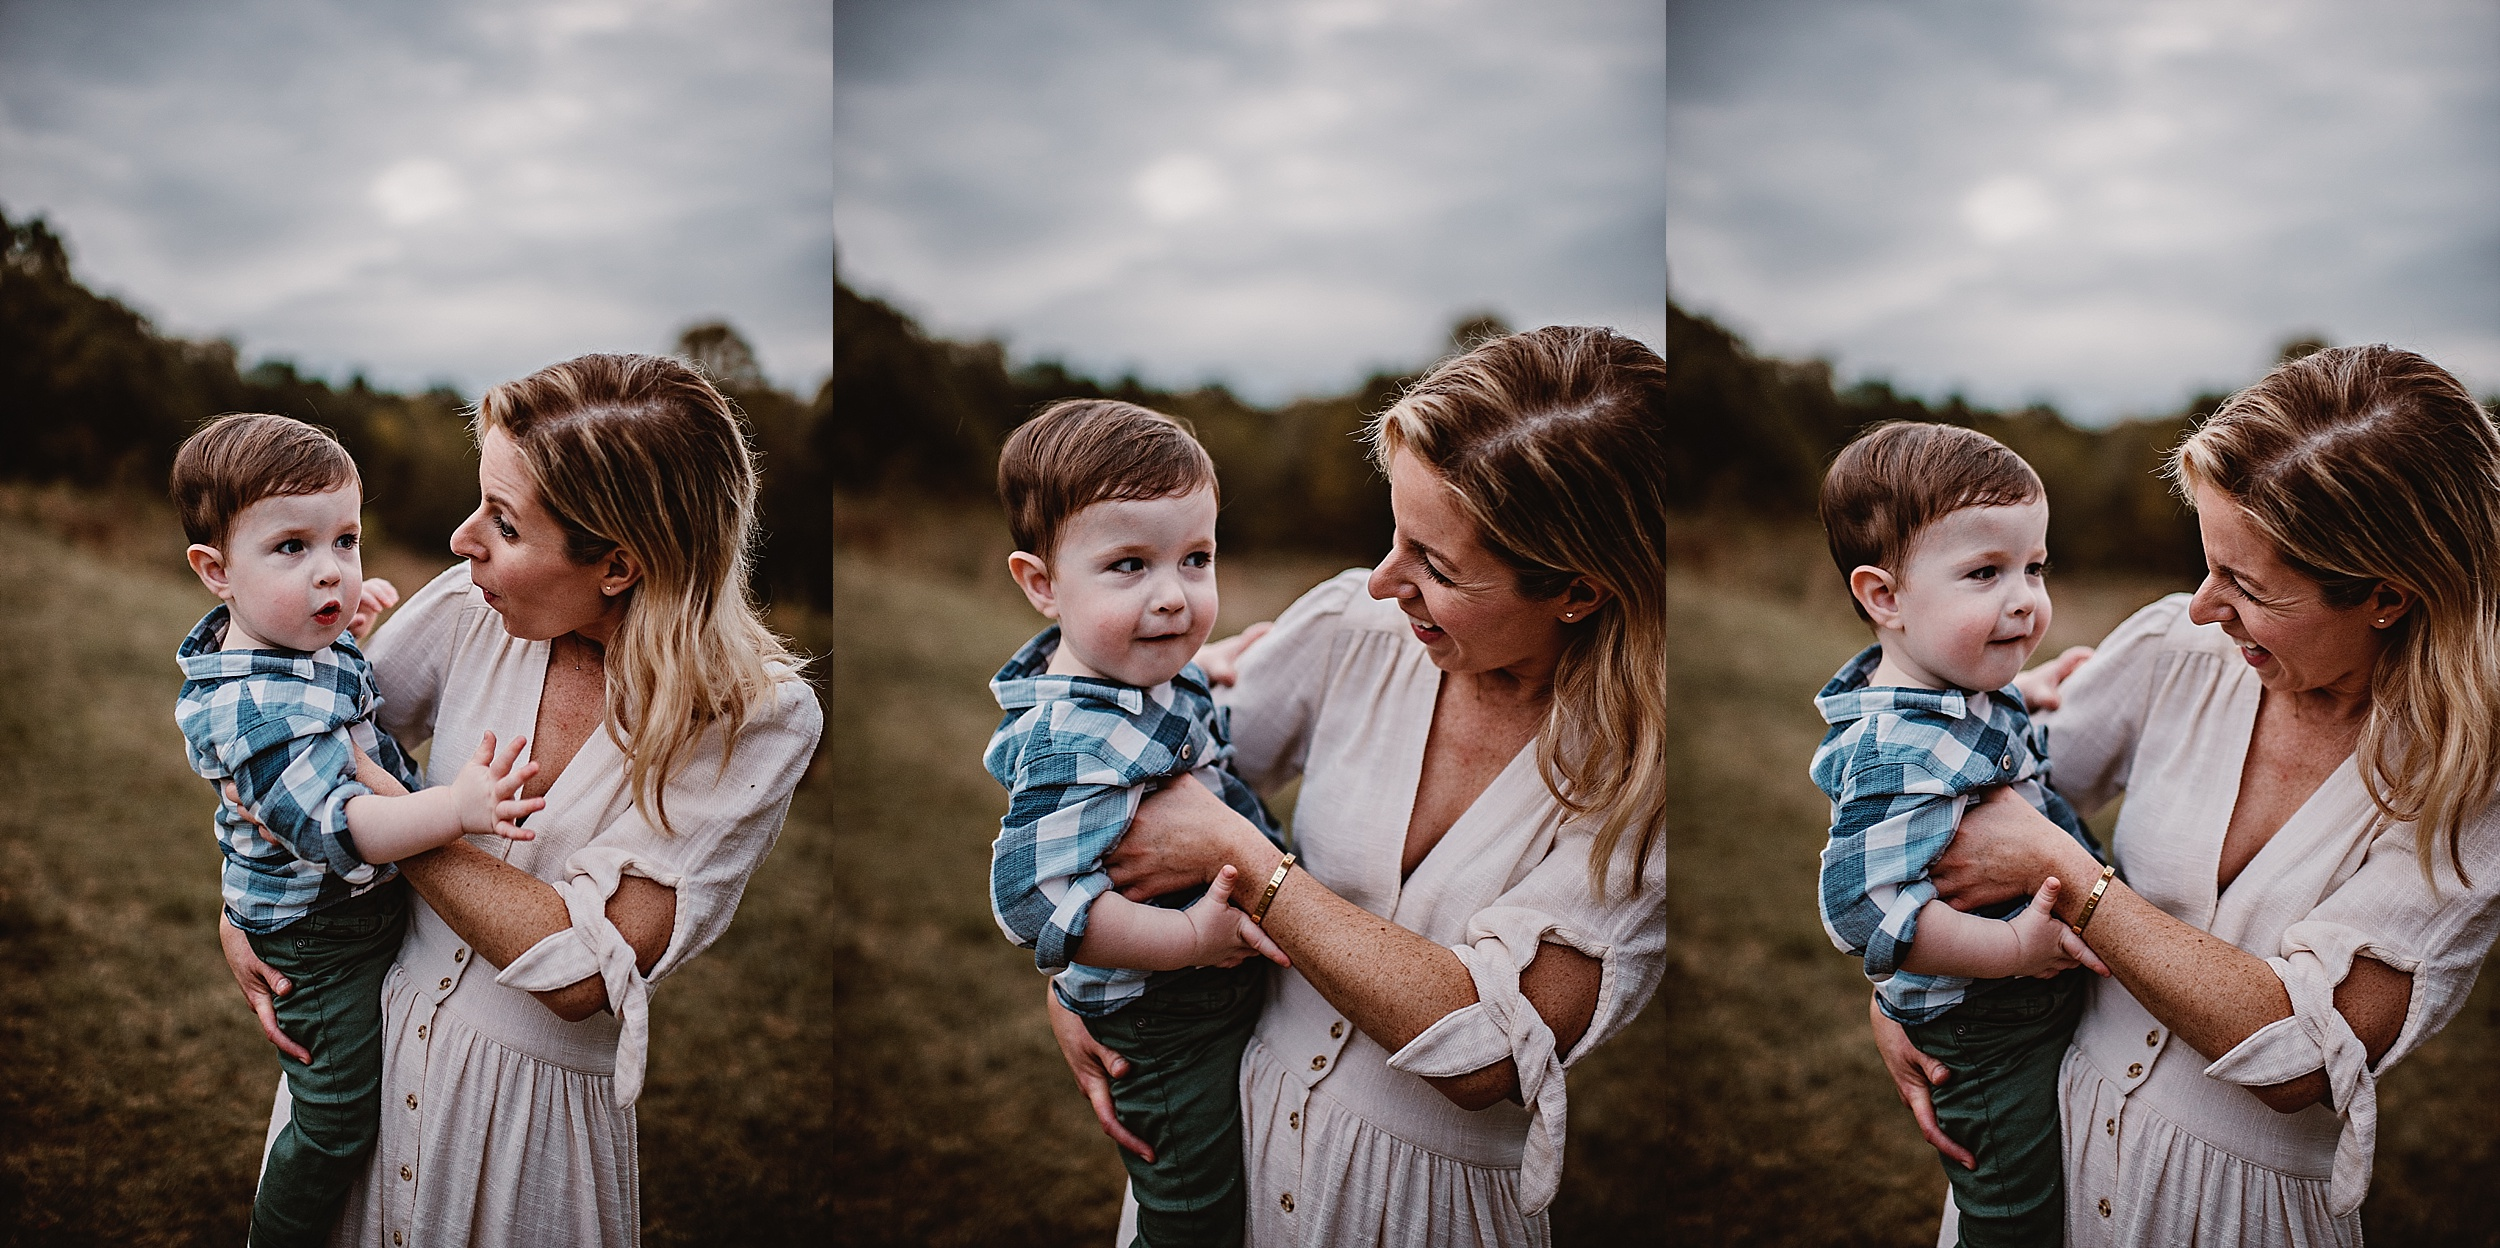 lauren-grayson-photography-portrait-artist-akron-cleveland-ohio-photographer-family-session-fields-sunset-fall_0209.jpg